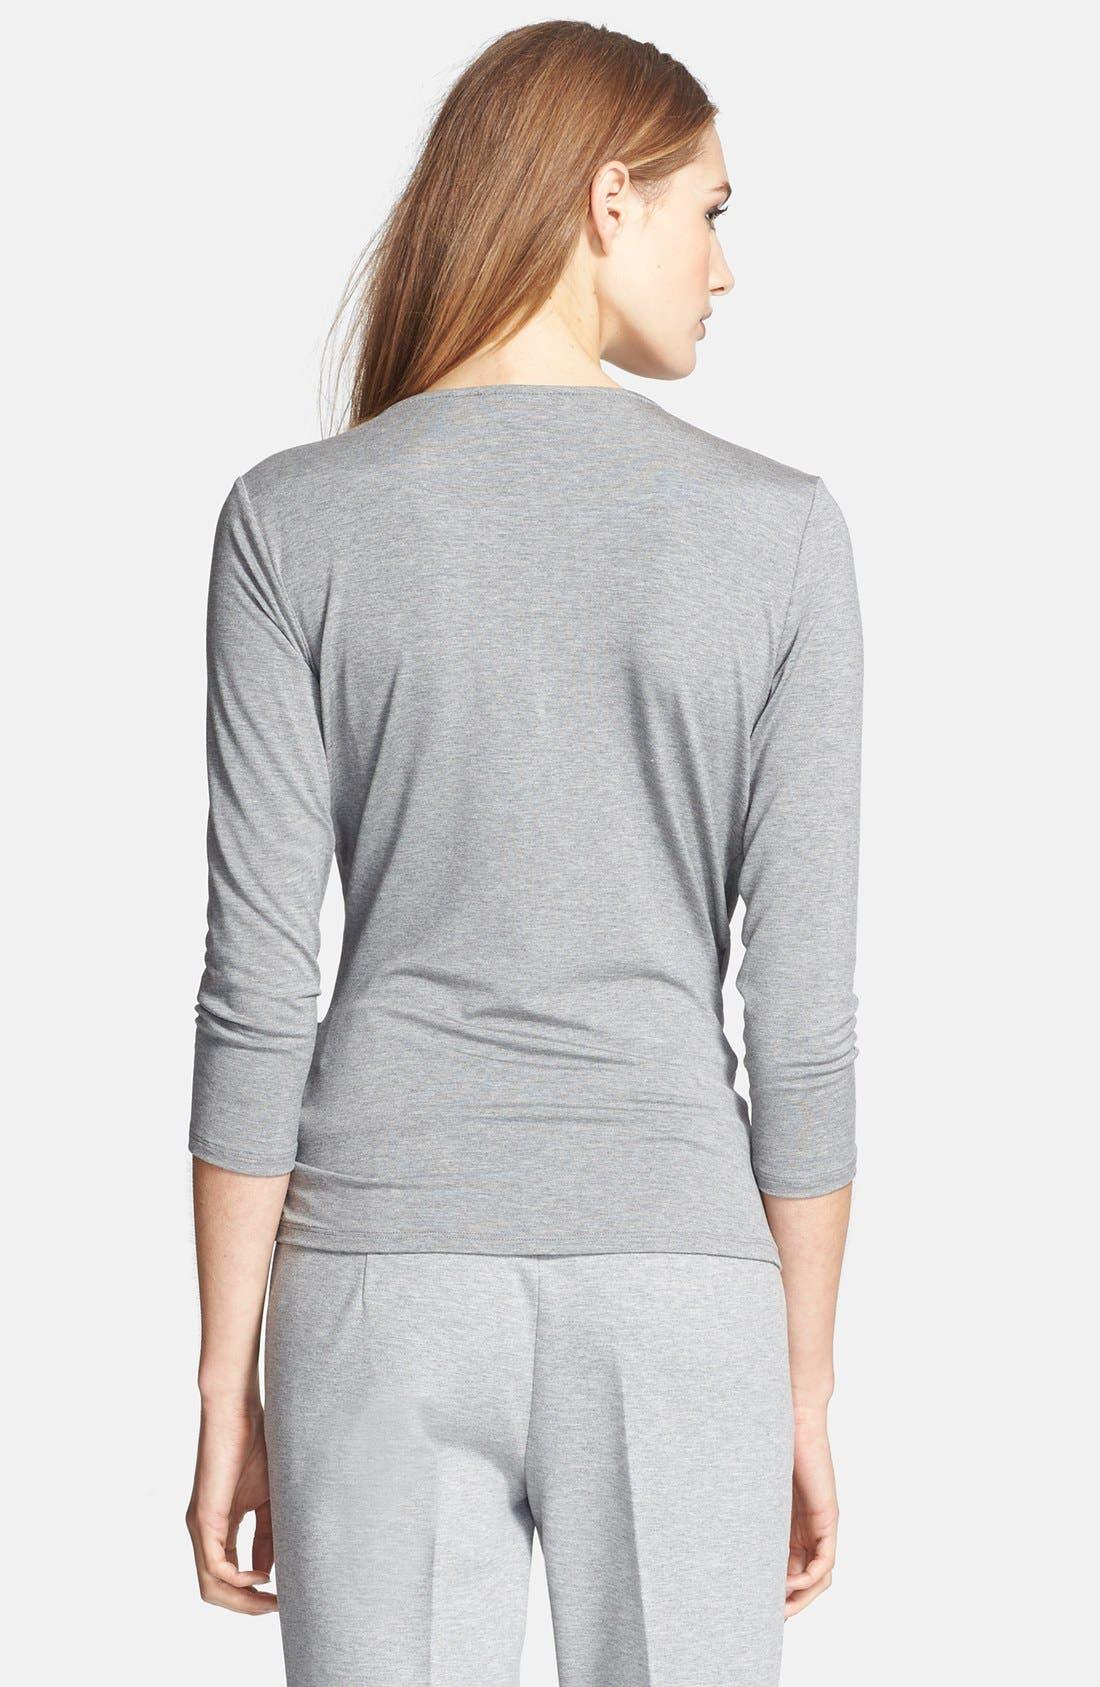 Alternate Image 2  - Max Mara 'Caprice' Faux Wrap Jersey Top